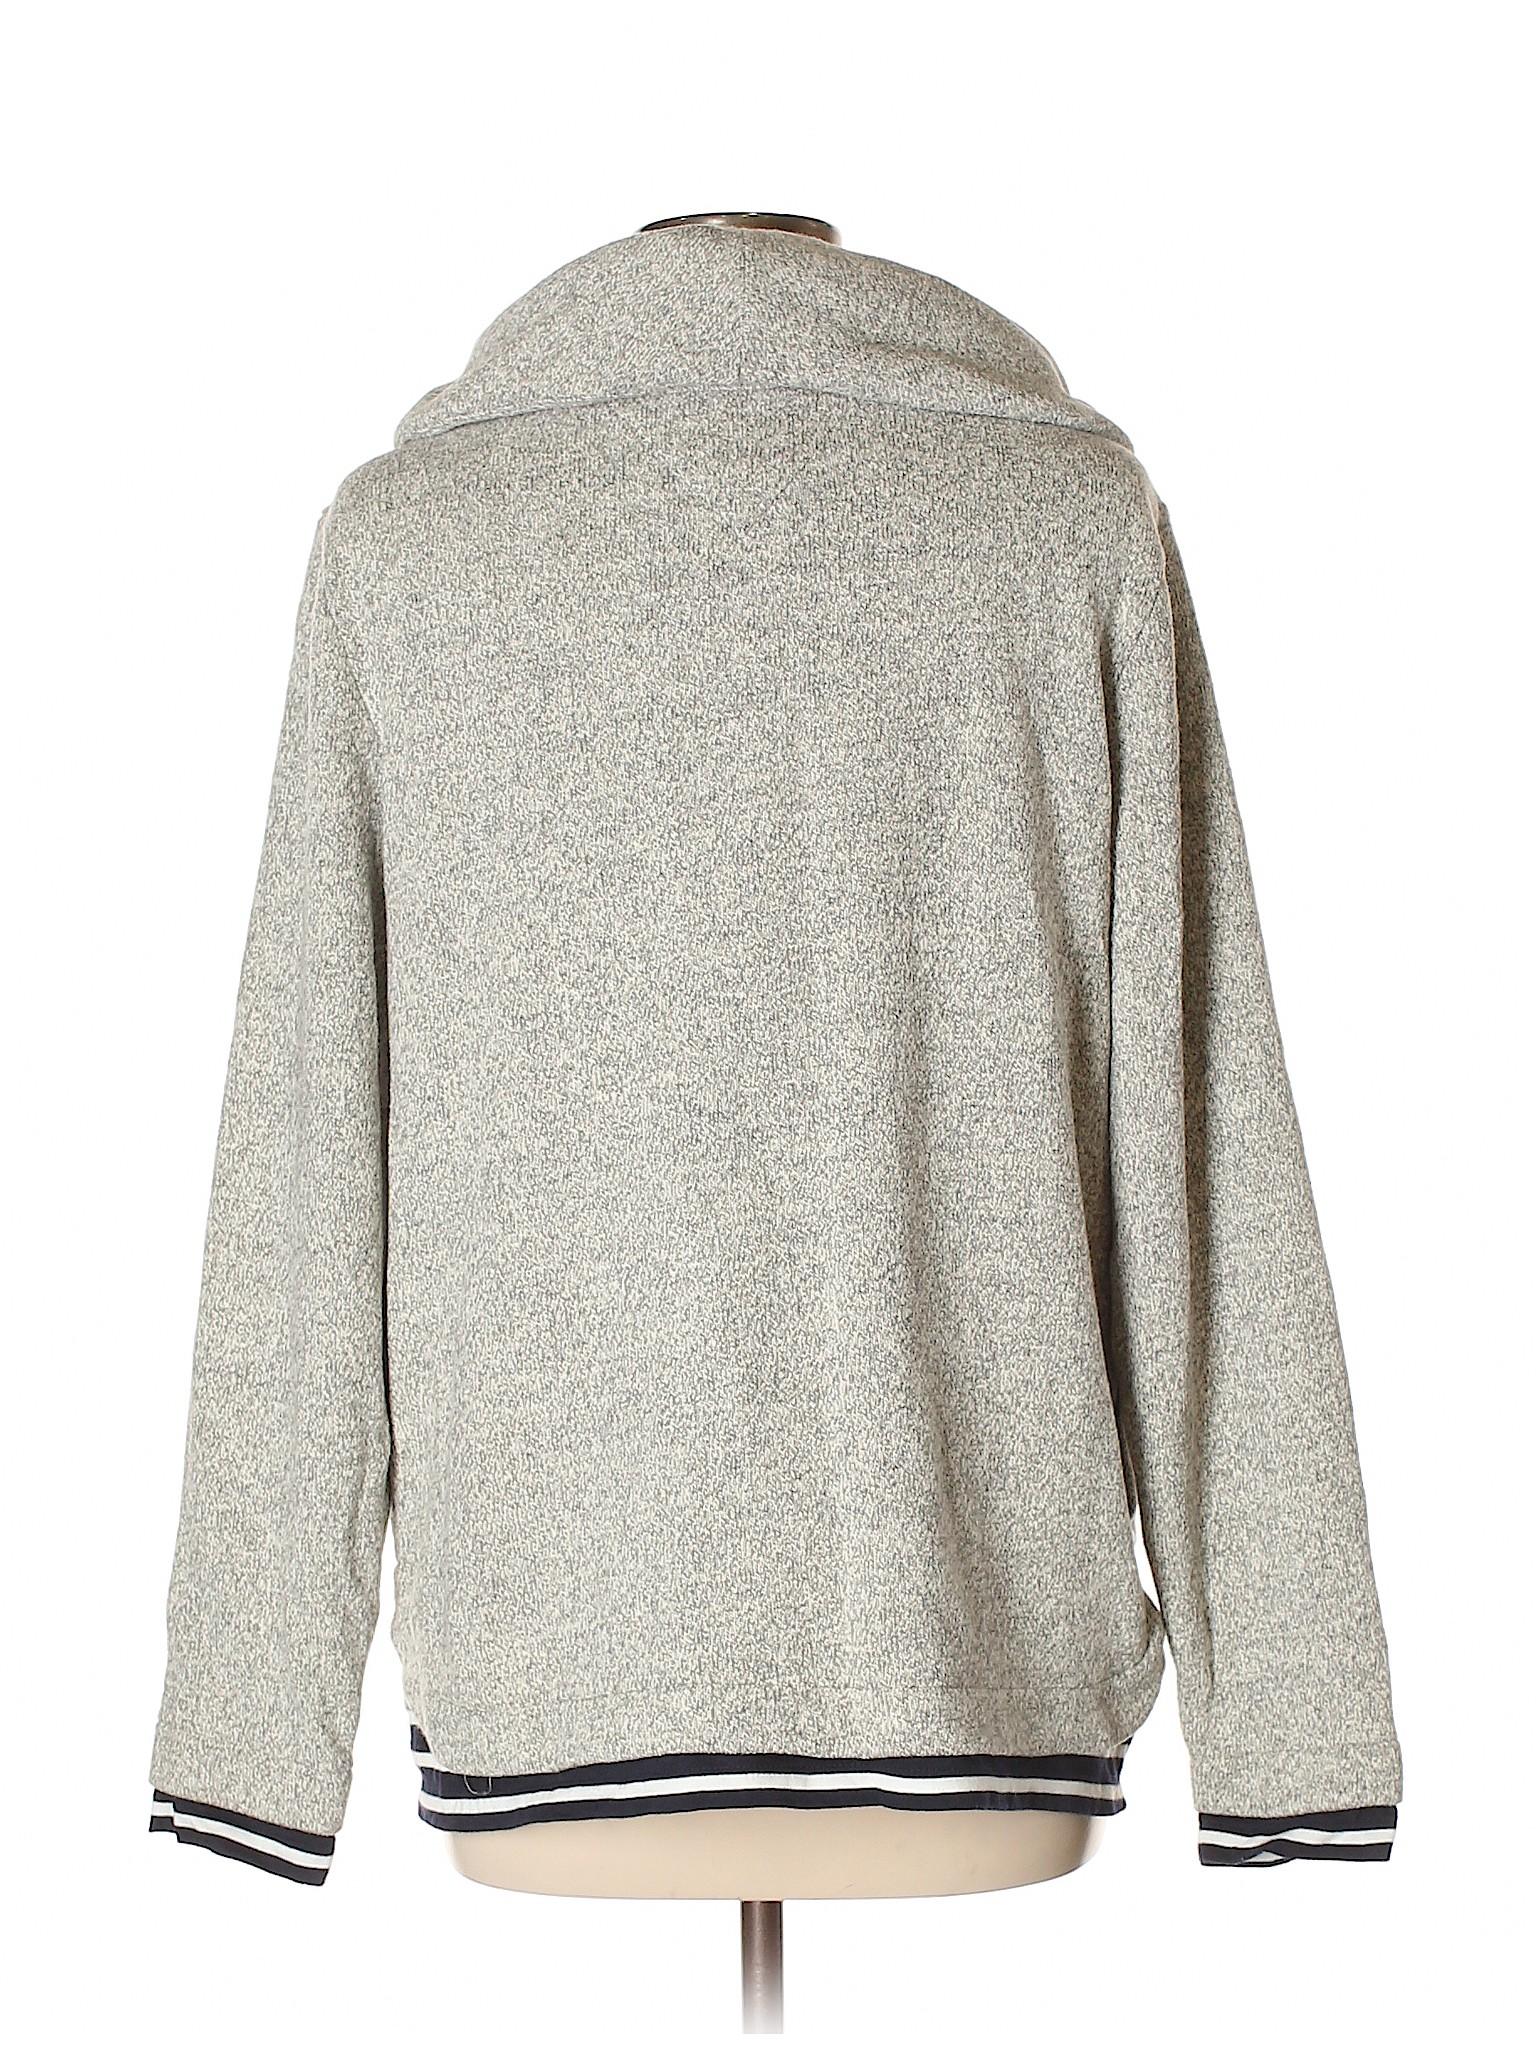 Tommy Hilfiger Tommy Pullover Boutique Hilfiger Tommy Sweater Hilfiger Sweater Pullover Boutique Boutique 8qwS1xtvz